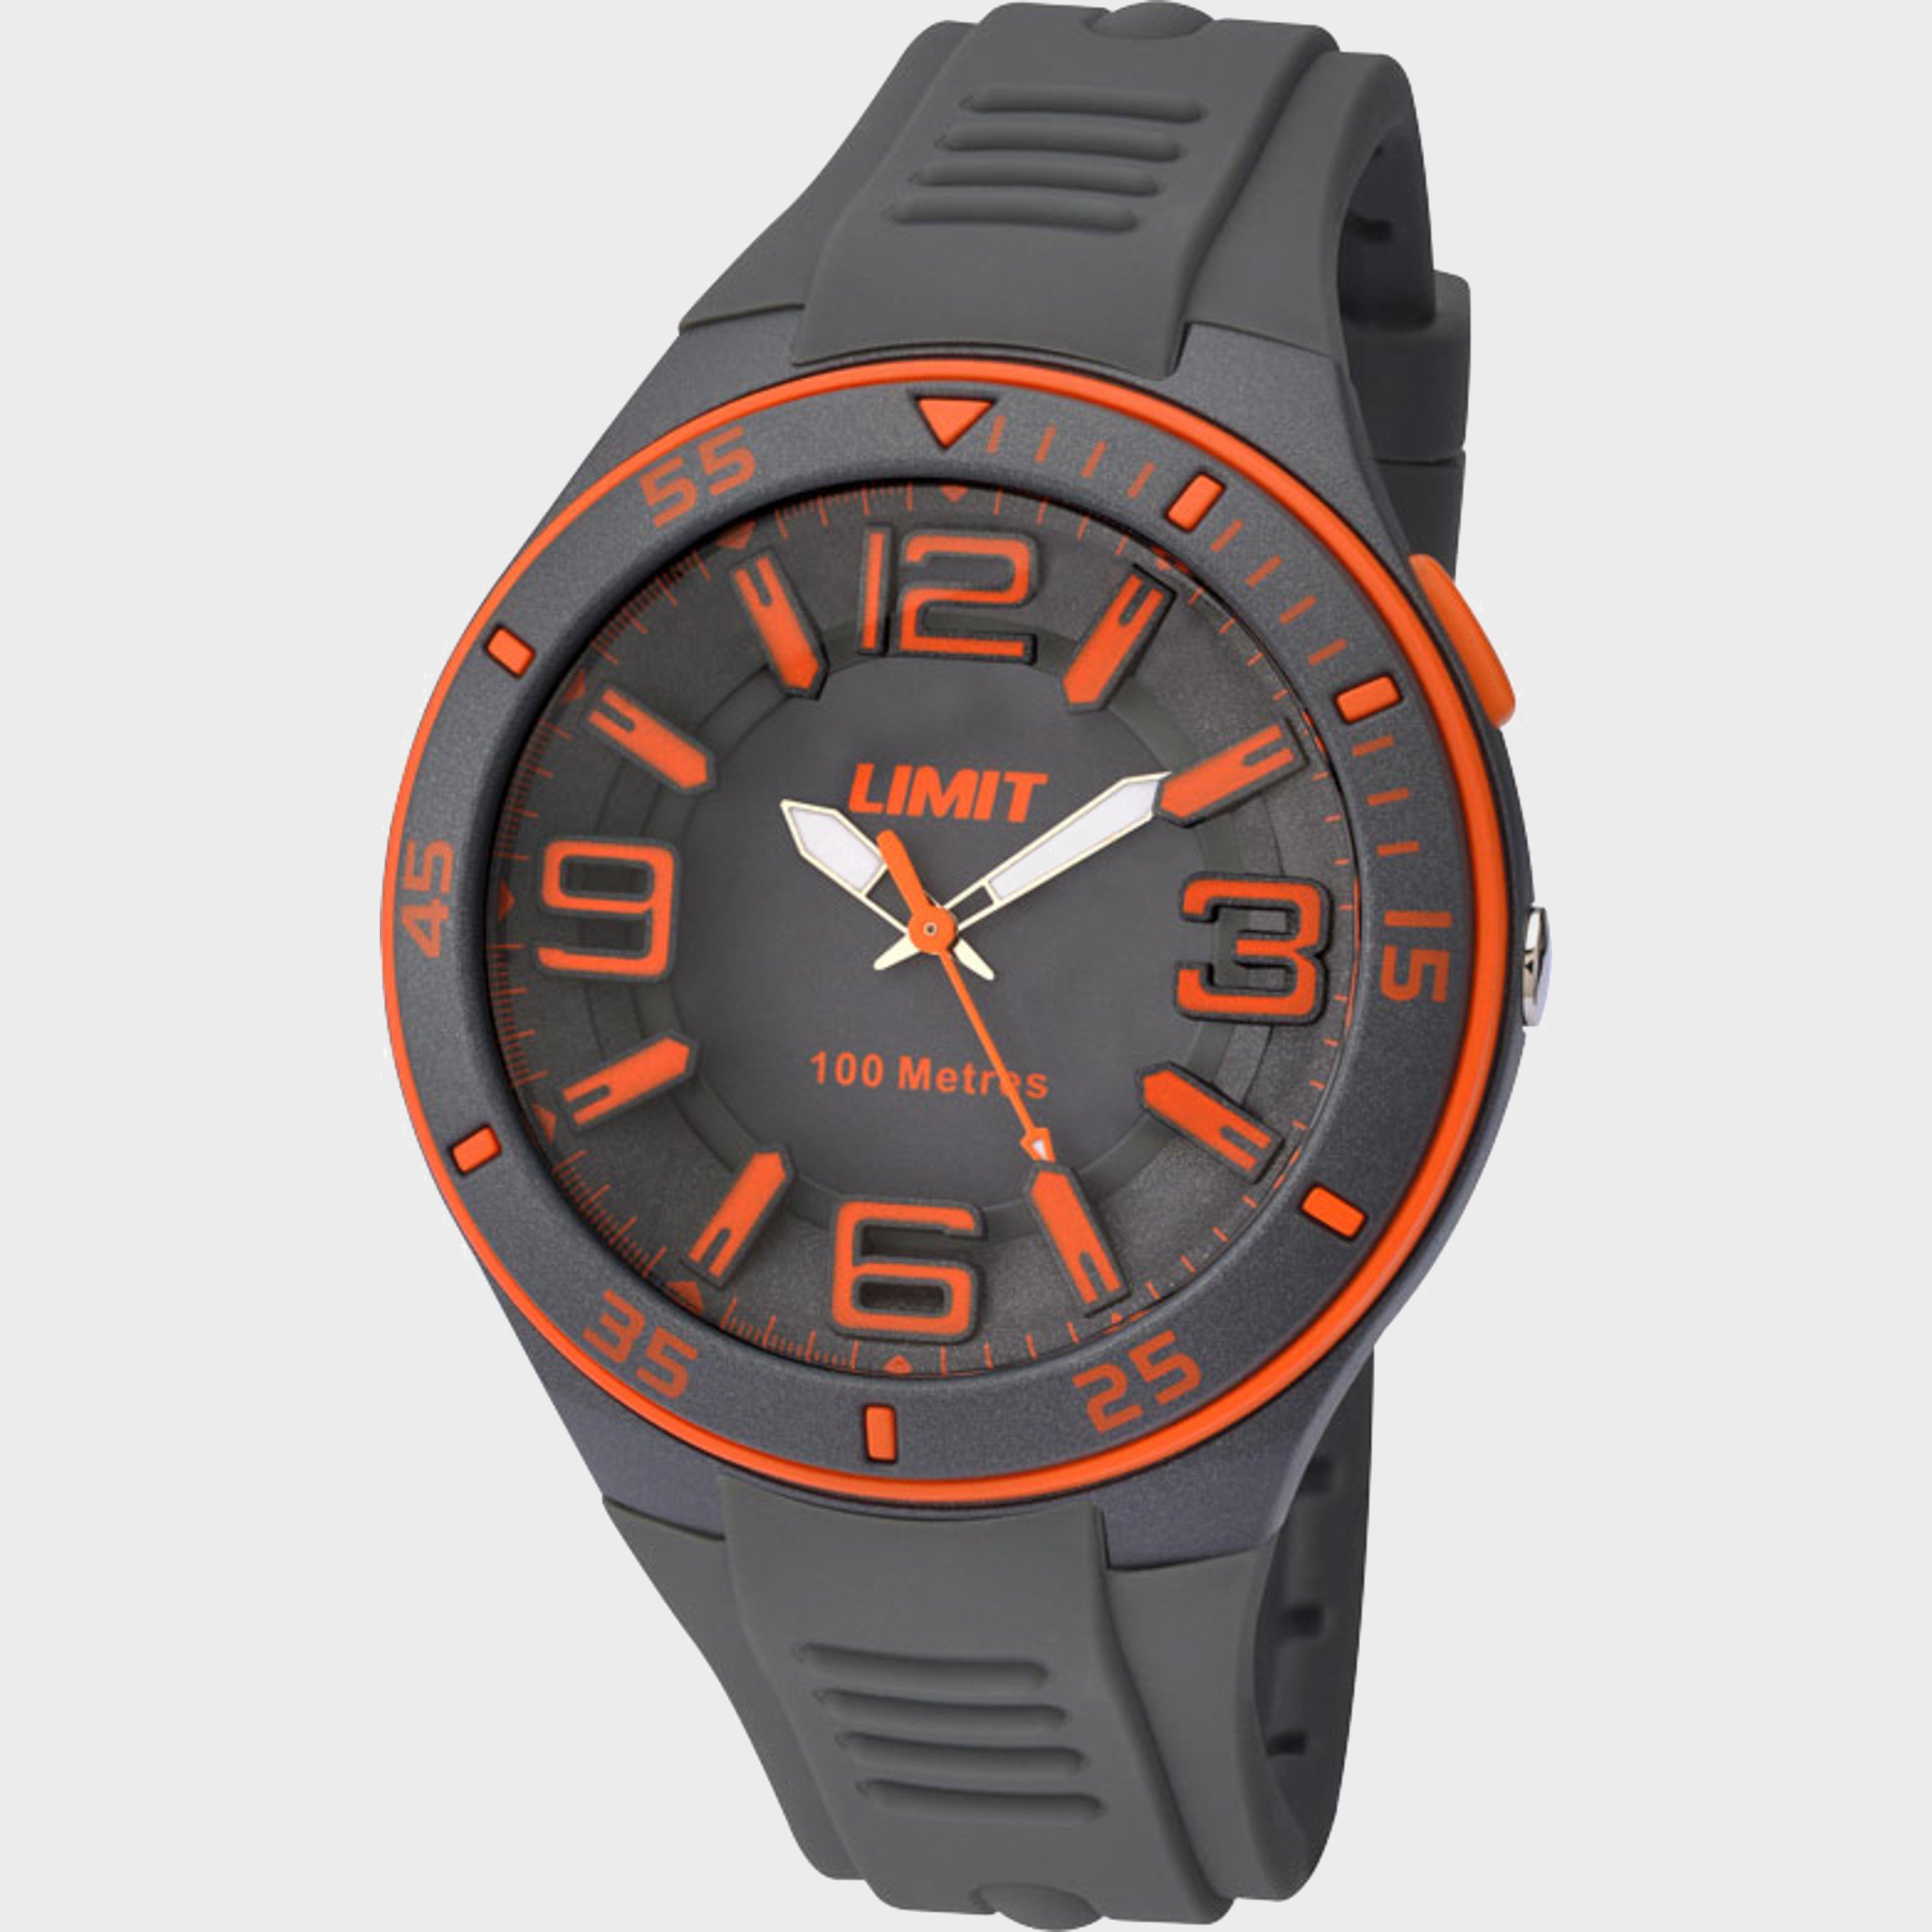 Limit Limit Active Analogue Watch